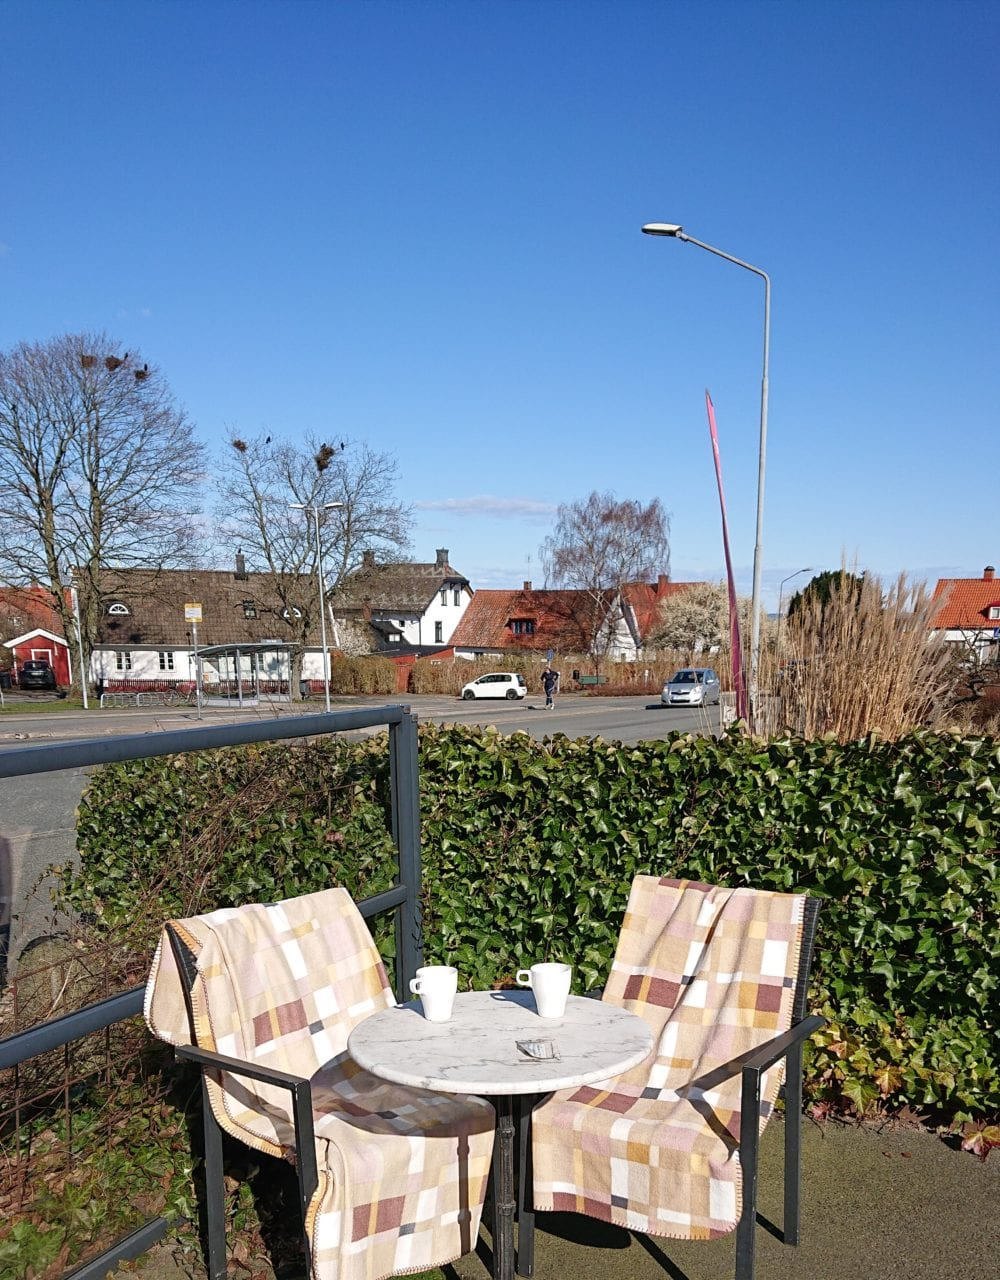 Enjoy a good coffee in the spring sun?!?